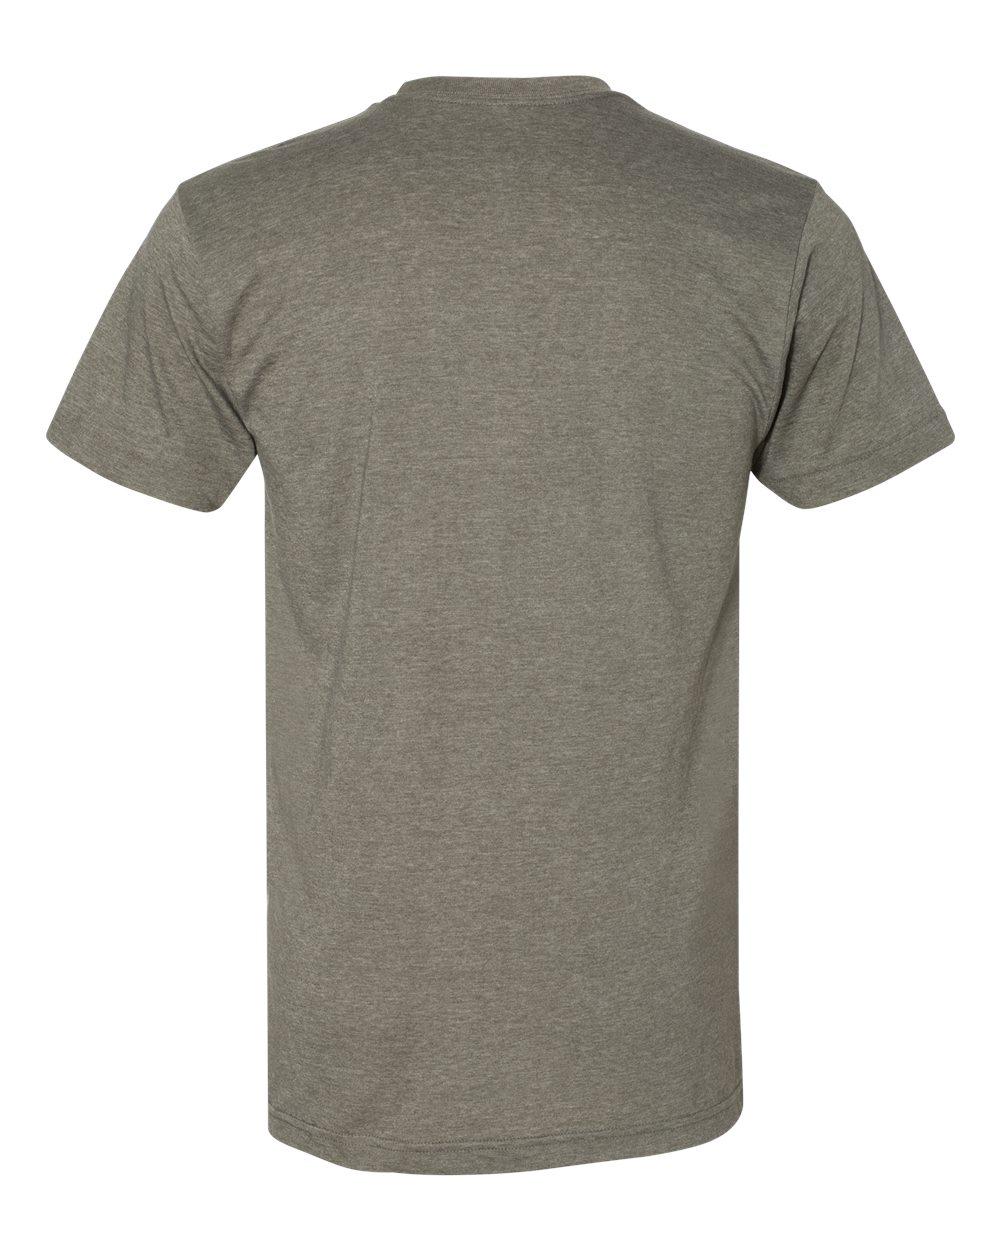 American-Apparel-Mens-Slim-Fit-50-50-Cotton-T-Shirt-Tee-BB401W-up-to-2XL thumbnail 31